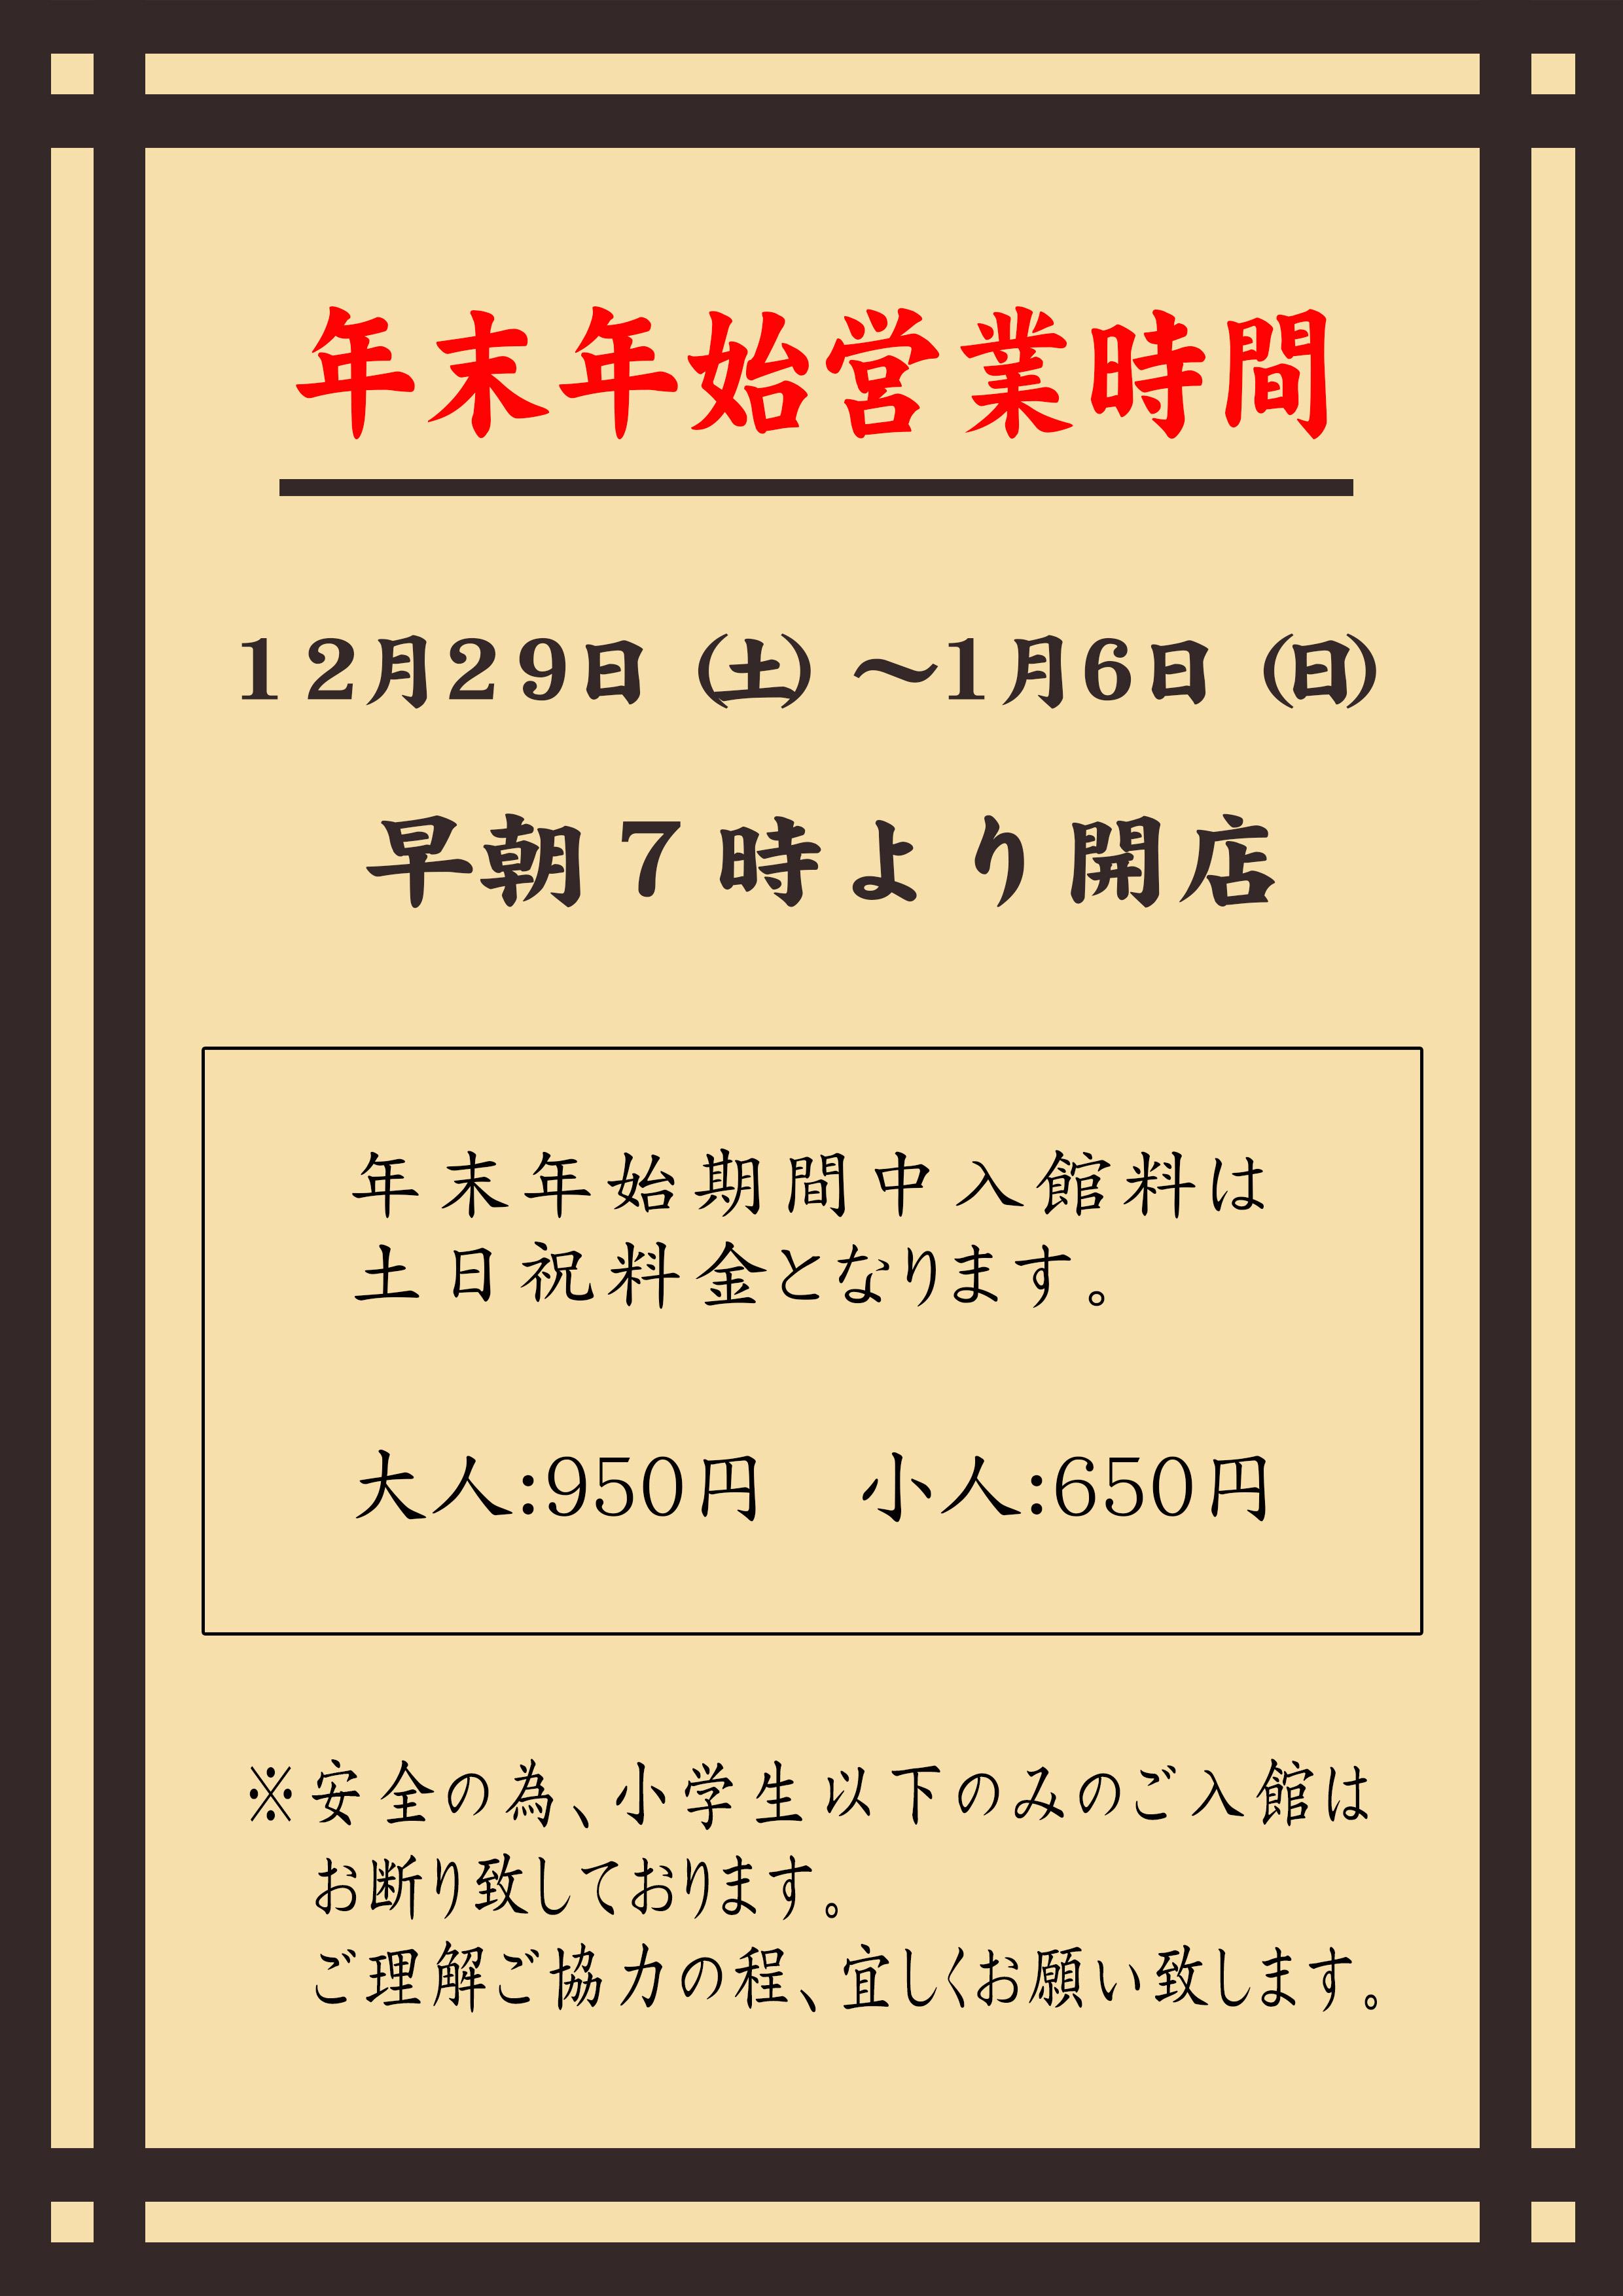 2019POP イベント 12月 年末年始 注意書き2